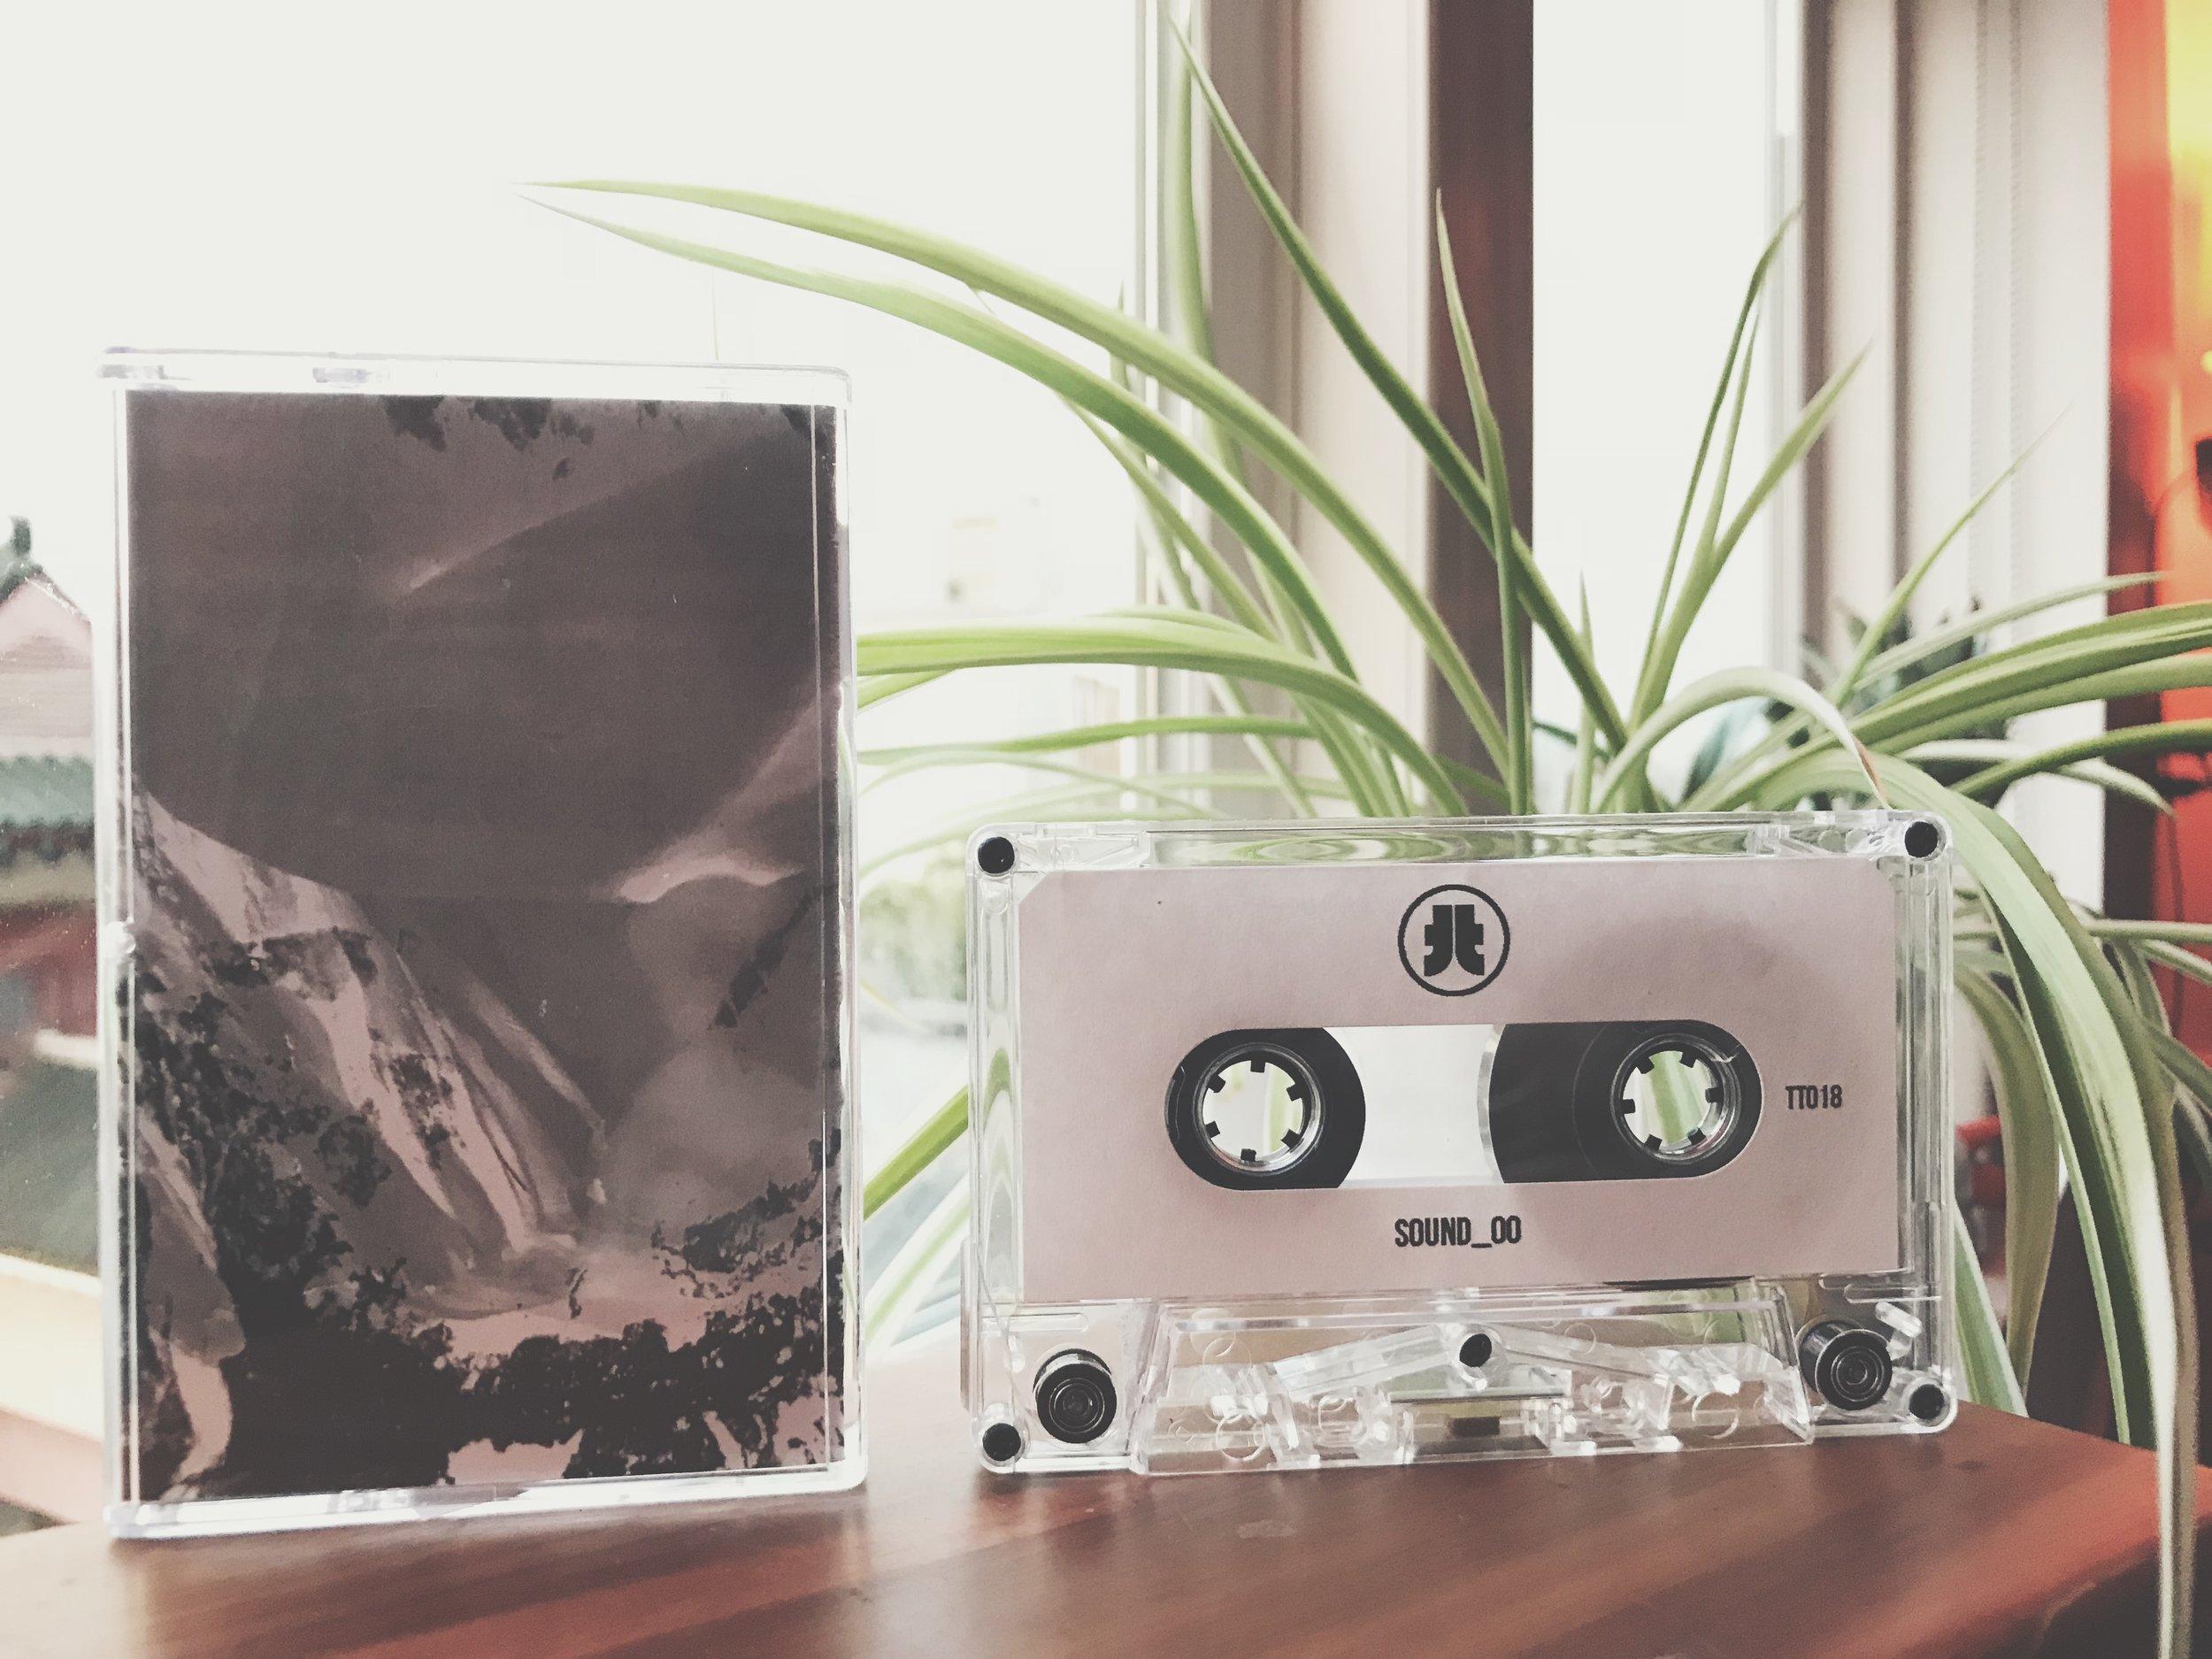 sound_00 / Big Geoffrey (Tandem Tapes)